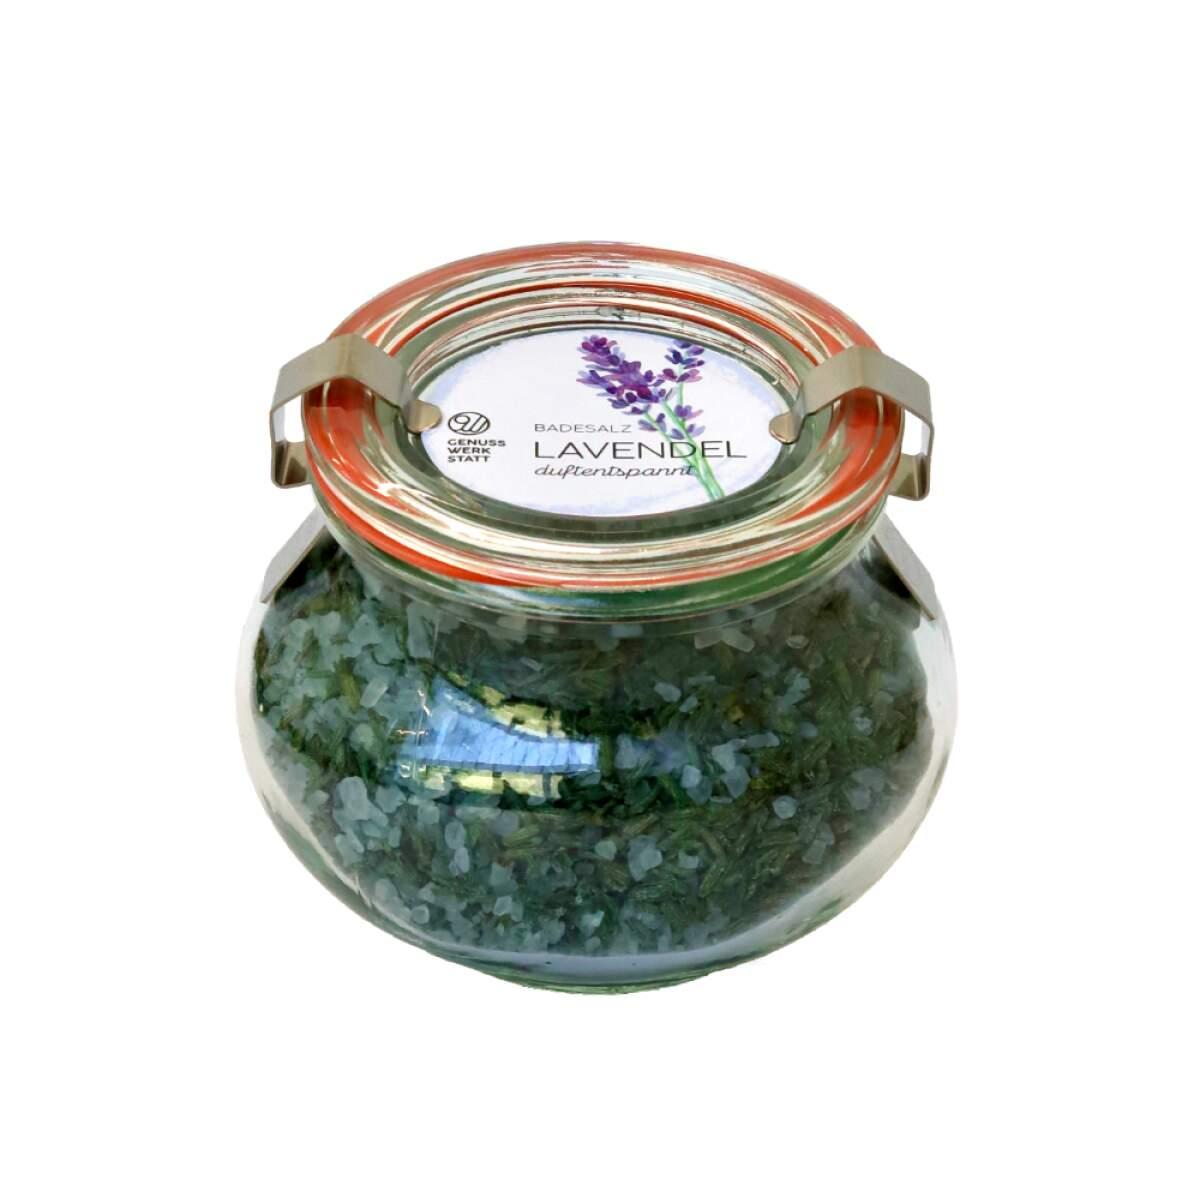 Badesalz-Schmuckglas-Lavendel_neu_2496_1000px